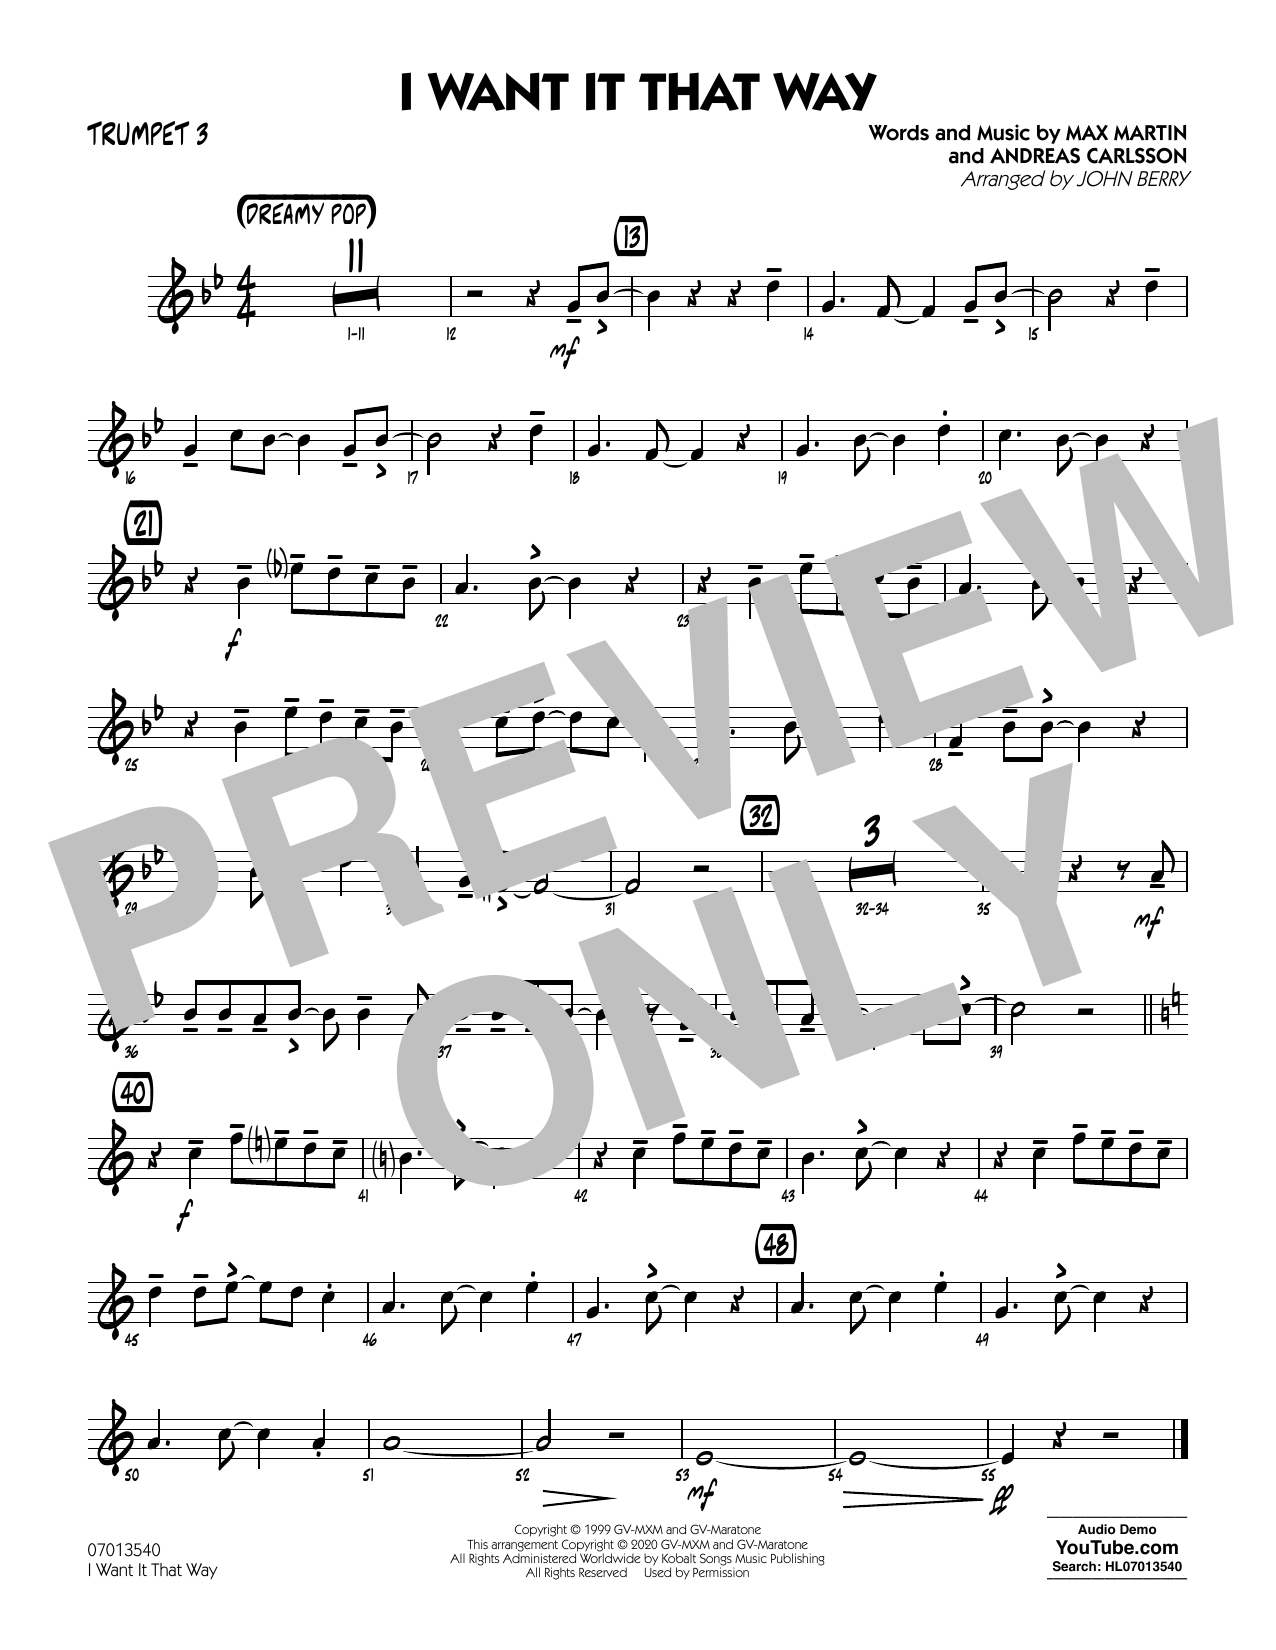 I Want It That Way (arr. John Berry) - Trumpet 3 Sheet Music